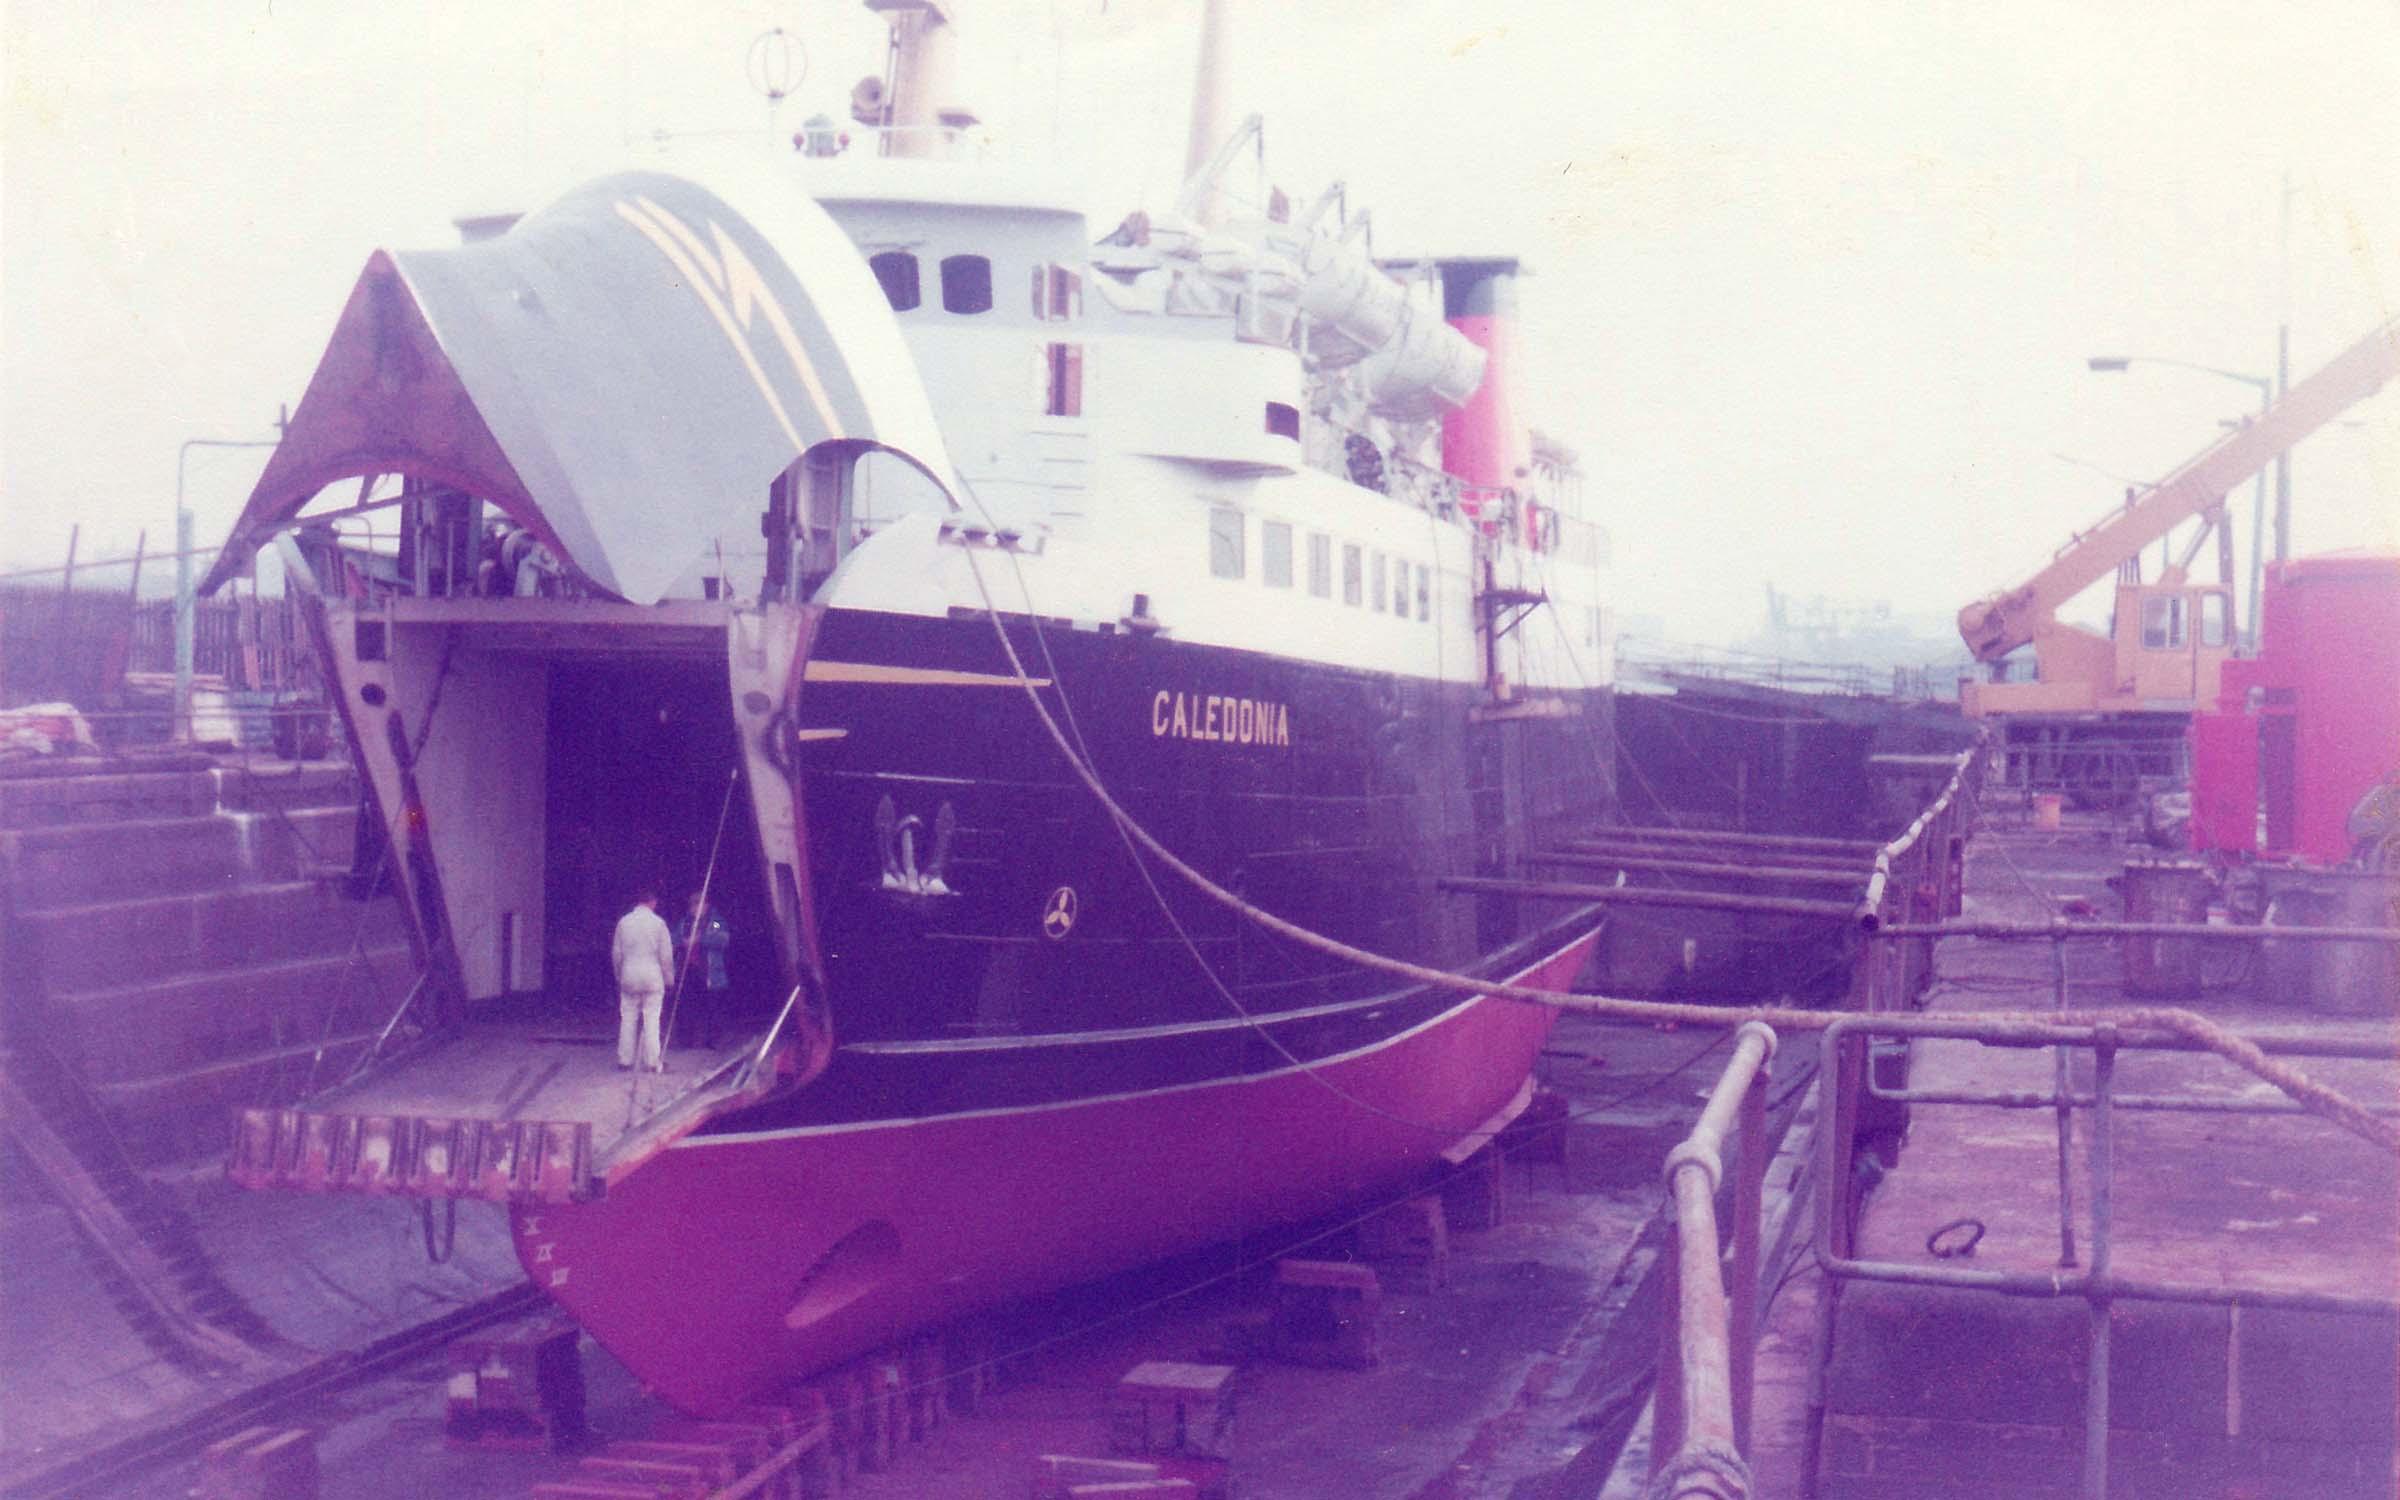 Caledonia in dry-dock (Ships of CalMac)